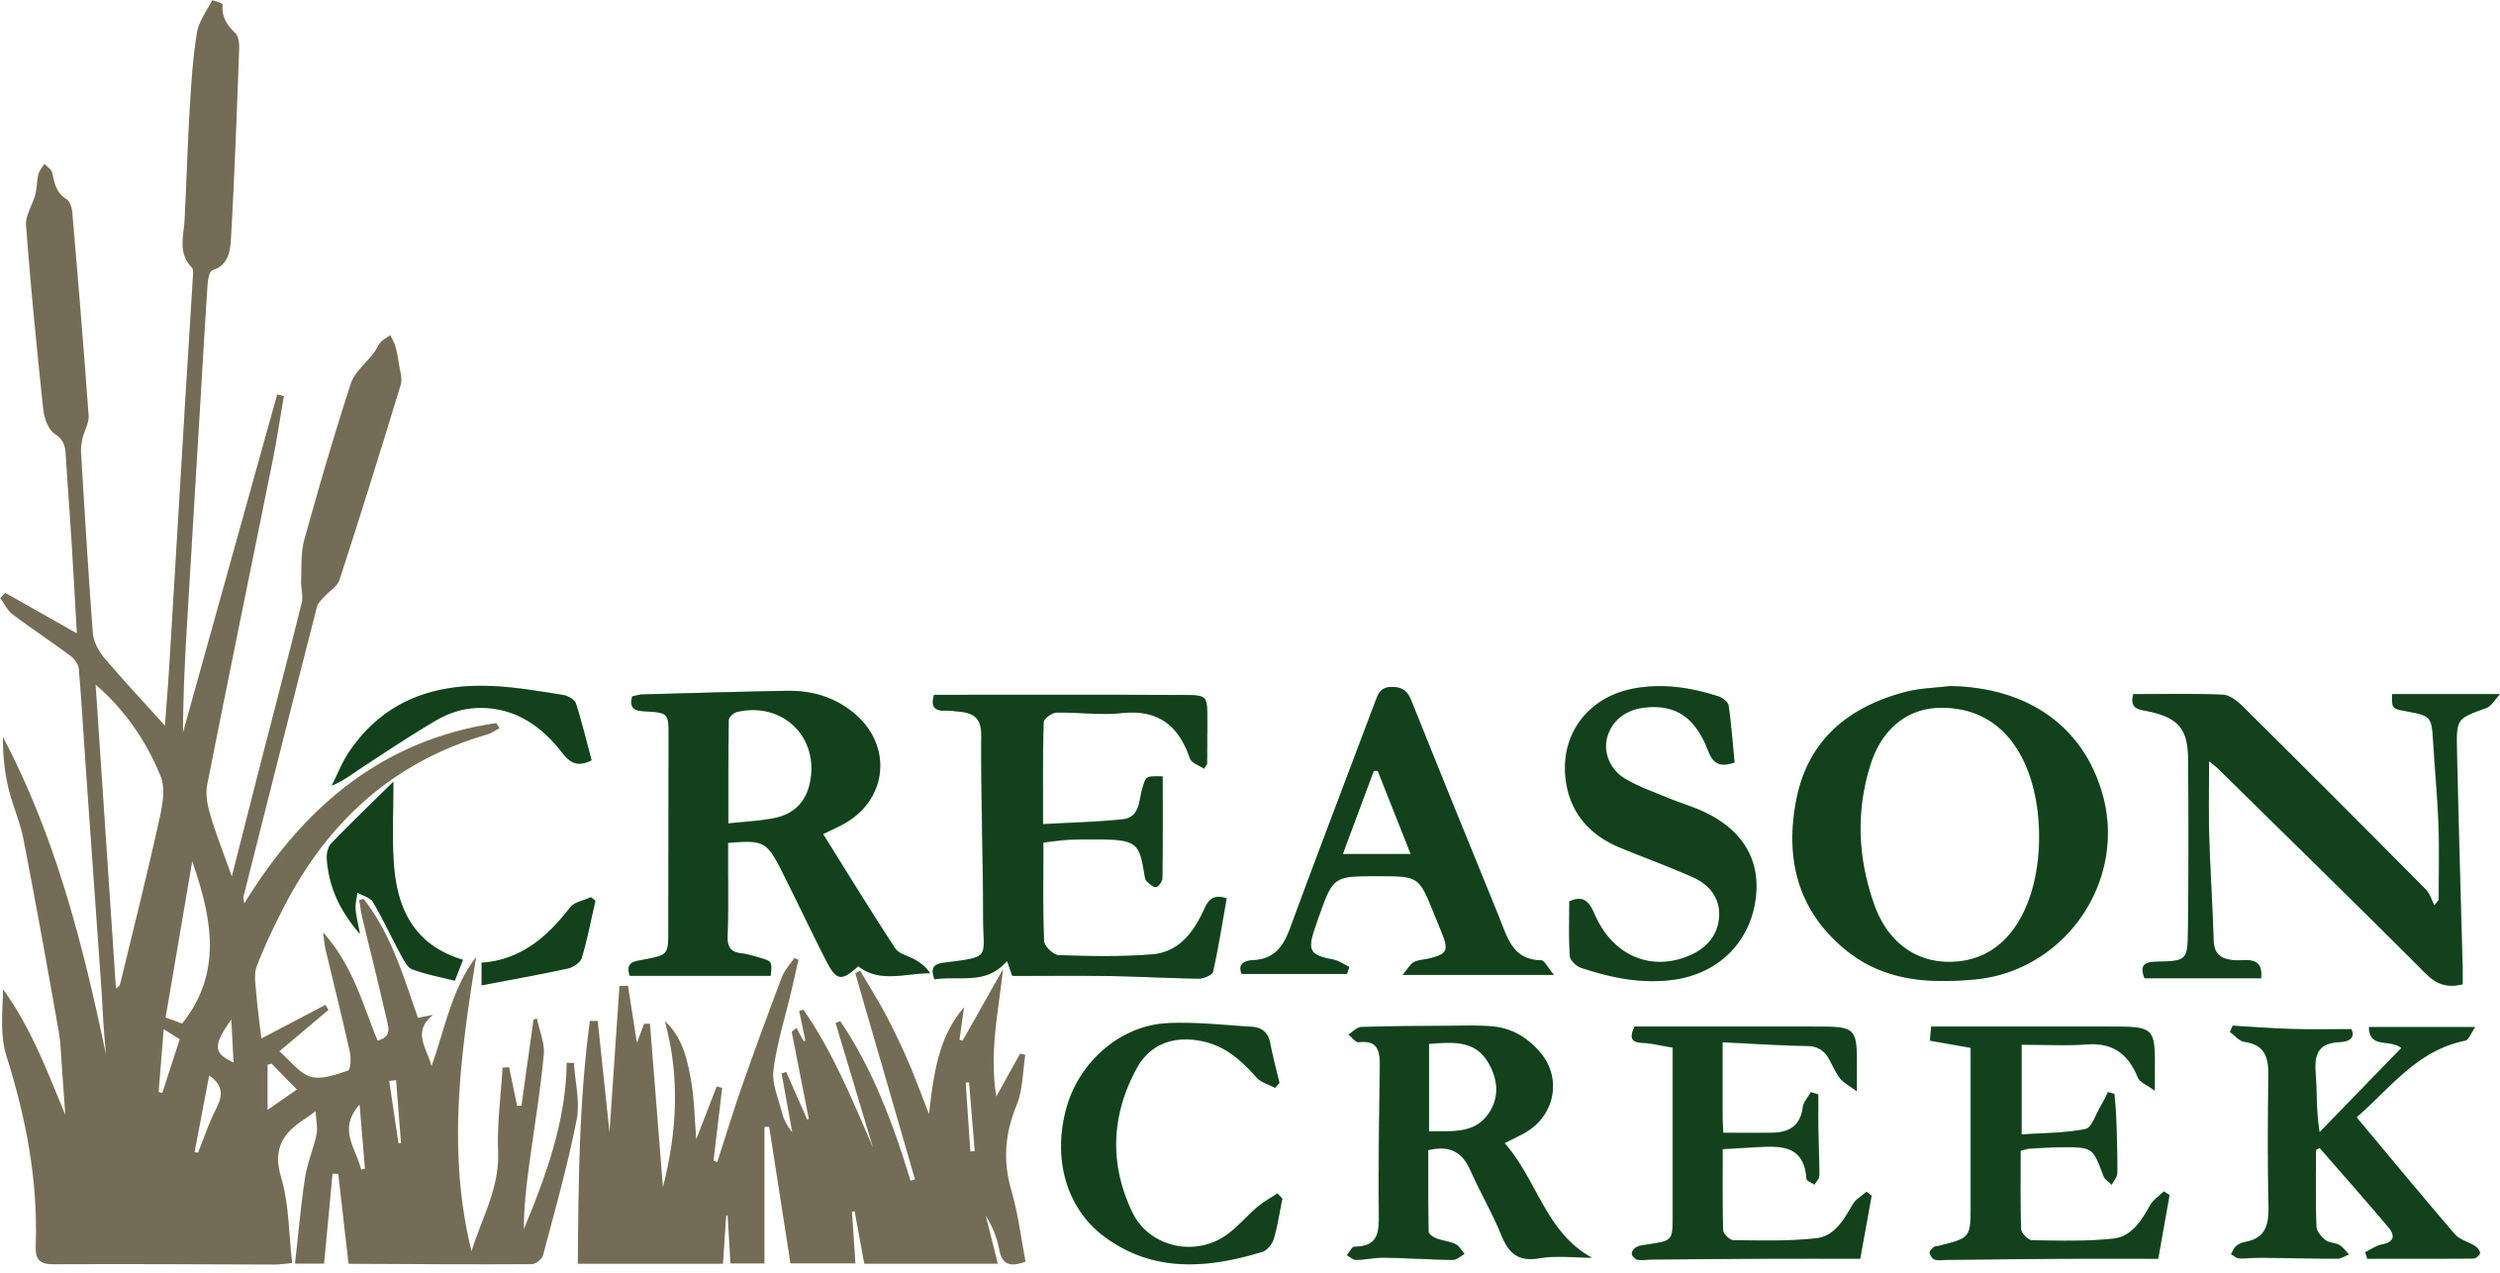 Creason_Creek_Logo.jpg